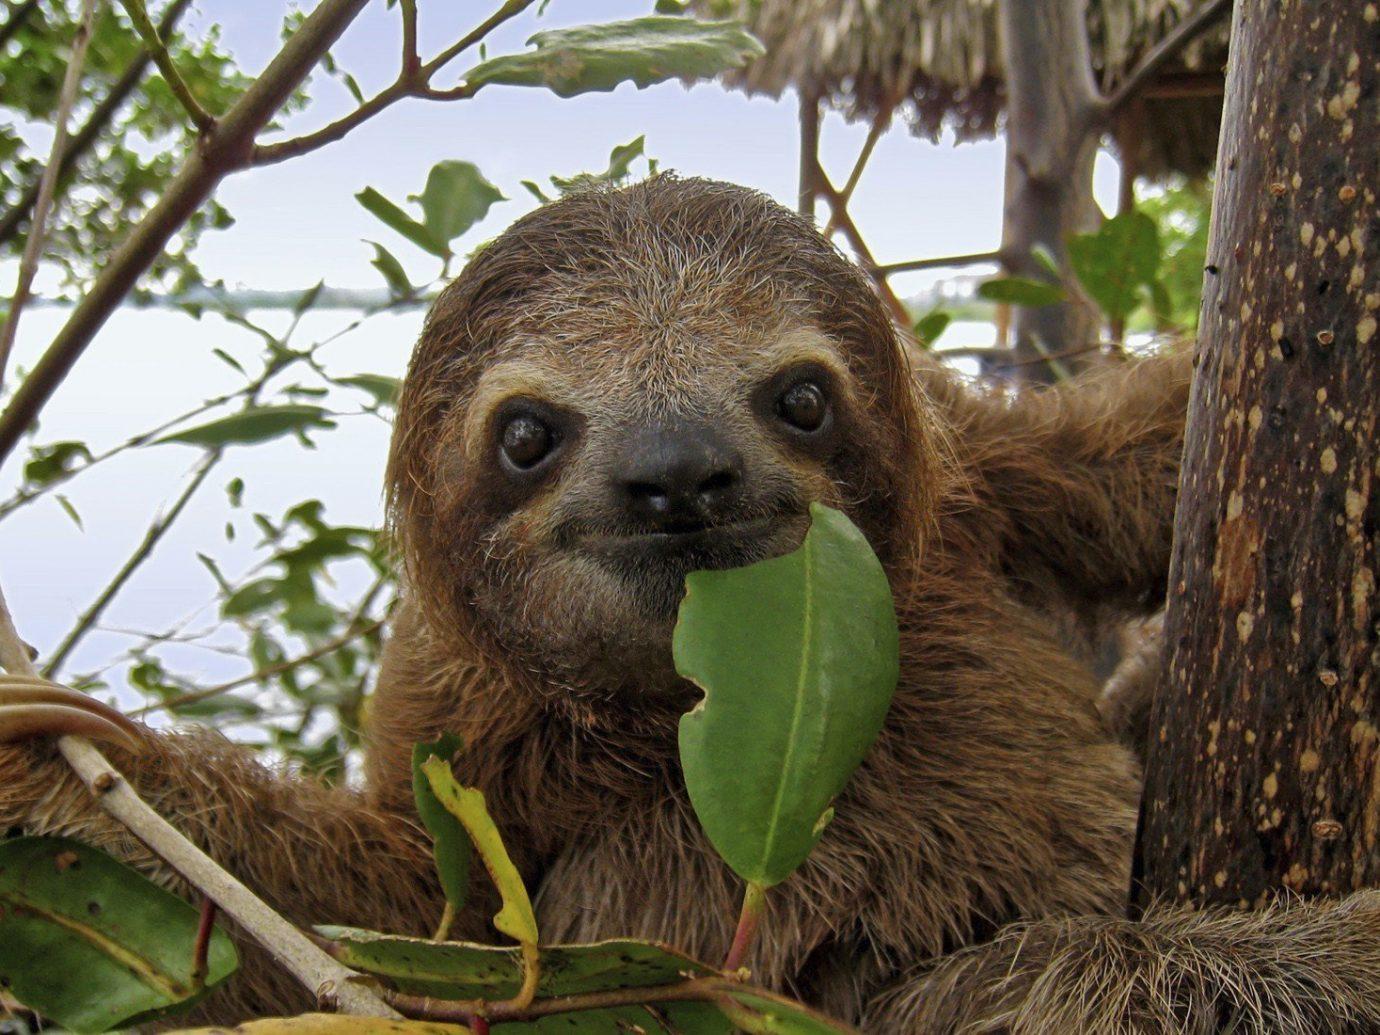 Trip Ideas tree outdoor animal mammal vertebrate Wildlife sloth fauna meerkat three toed sloth zoo trunk